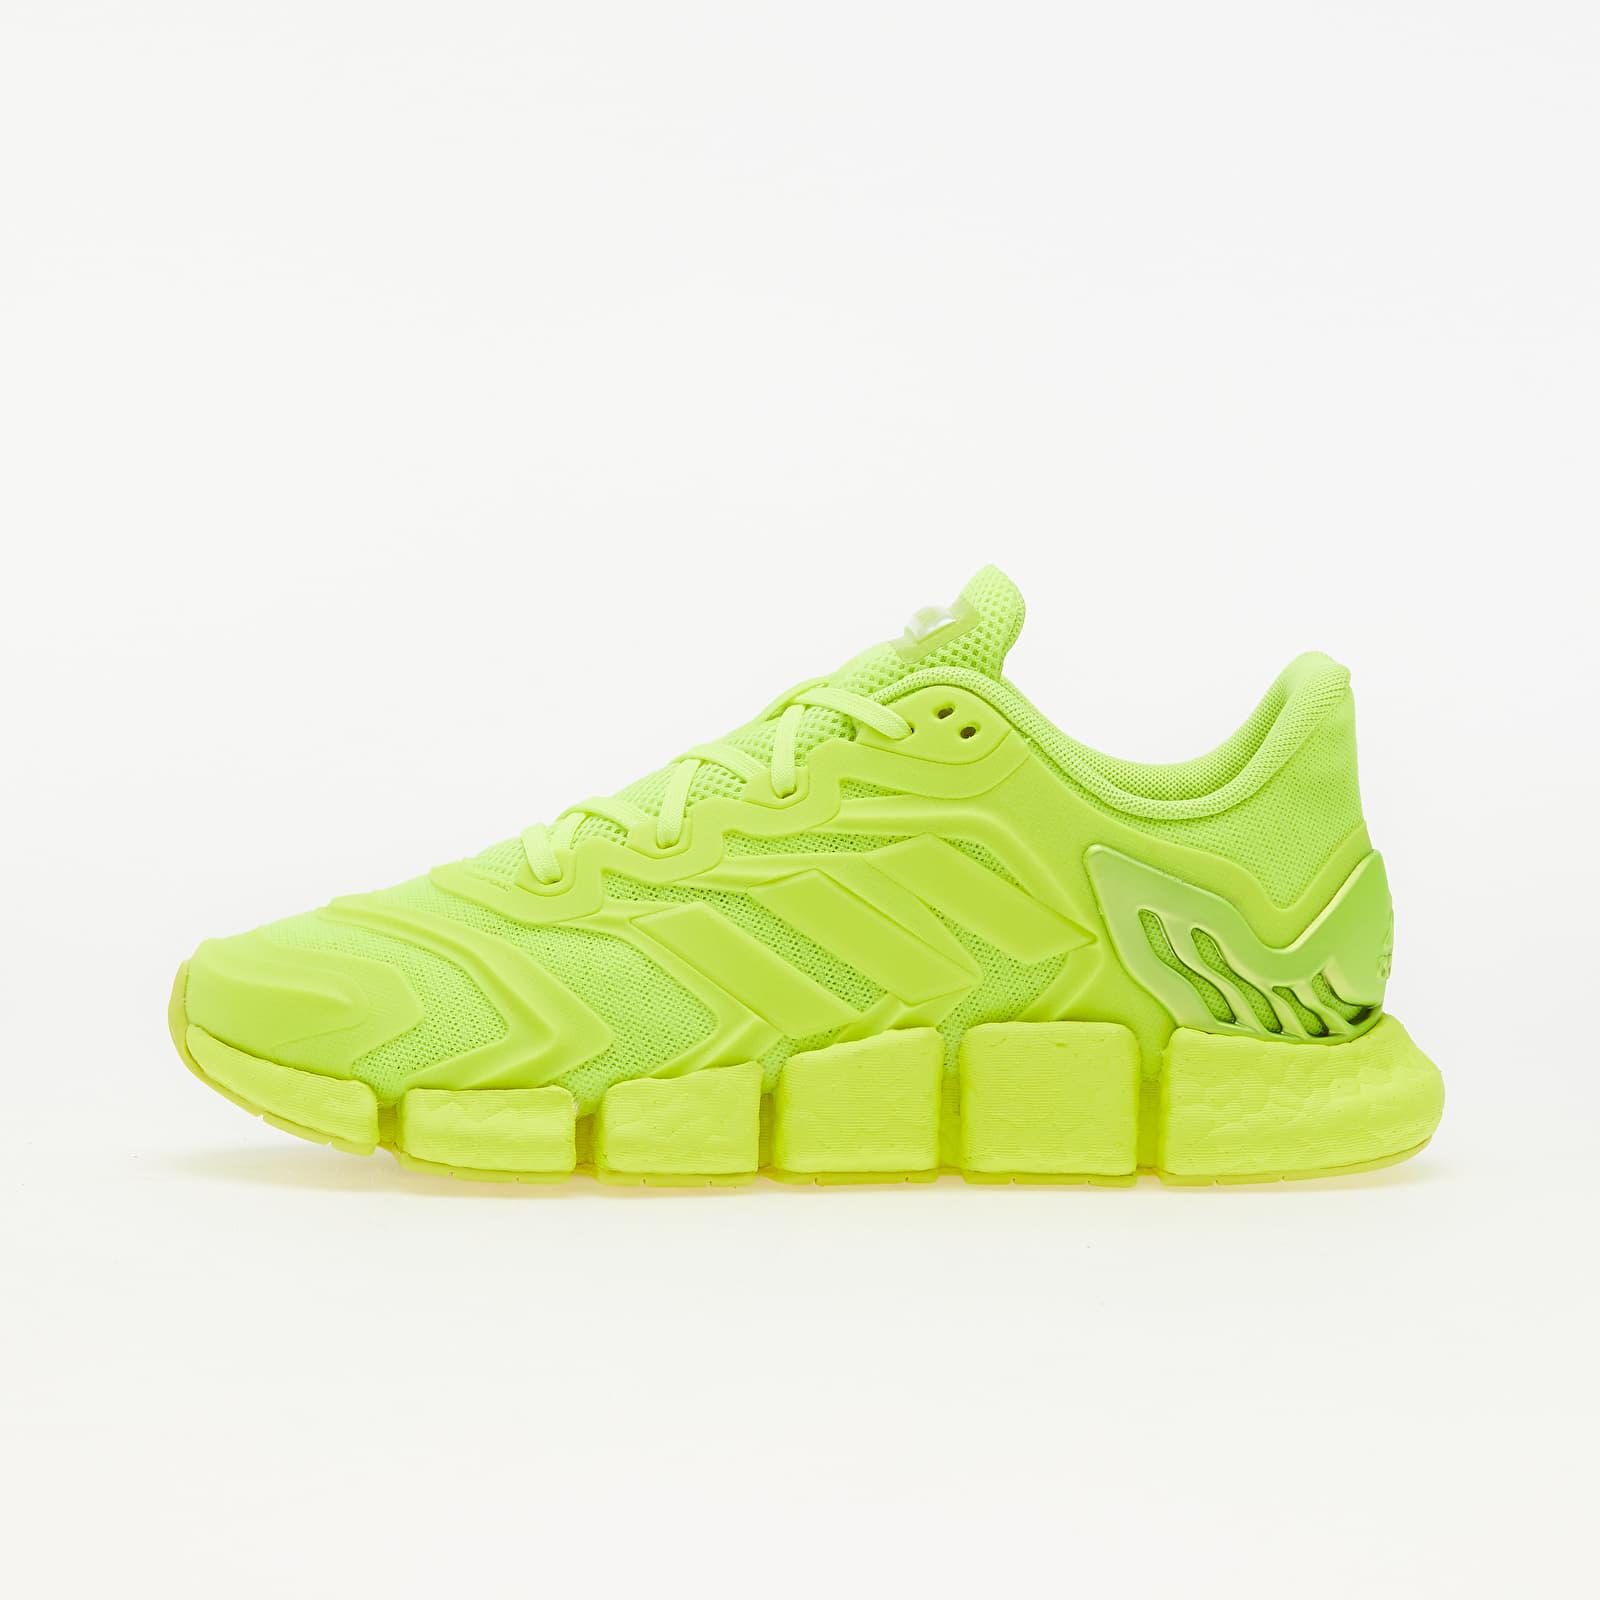 adidas Climacool Vento Solar Yellow/ Solar Yellow/ Core Black EUR 44